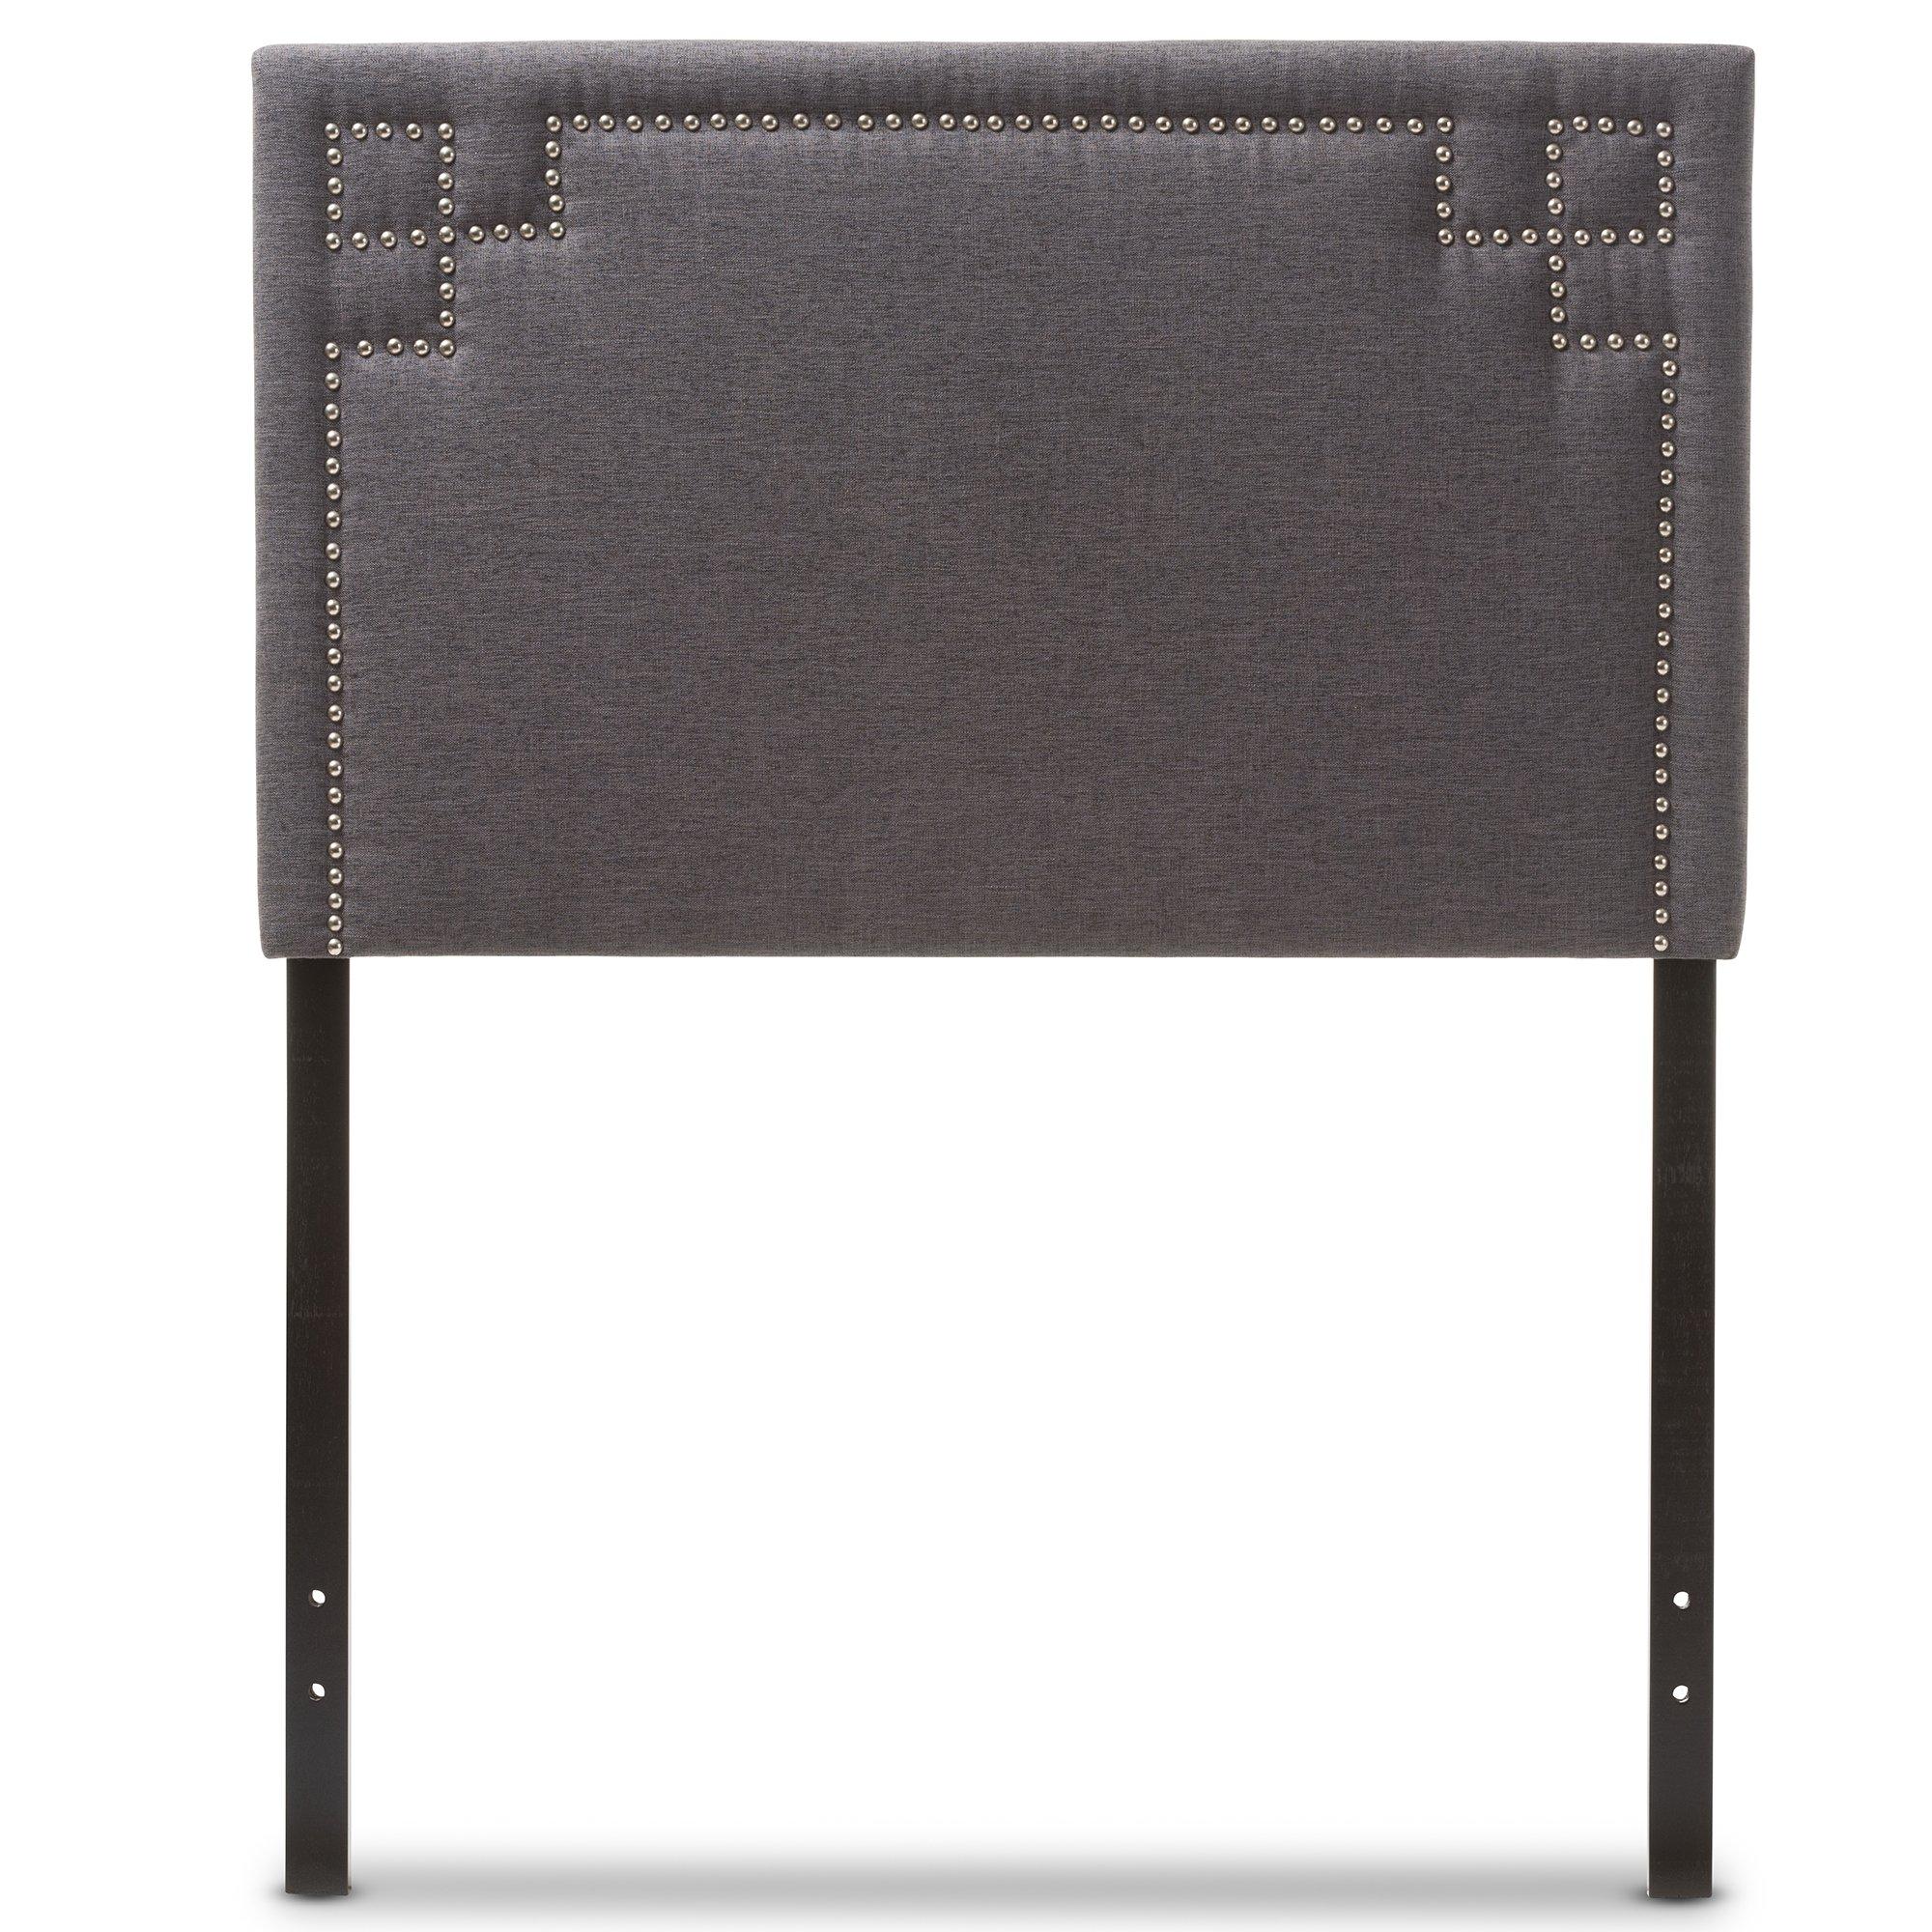 Baxton Studio Gallia Modern and Contemporary Dark Grey Fabric Upholstered Headboard, Twin by Baxton Studio